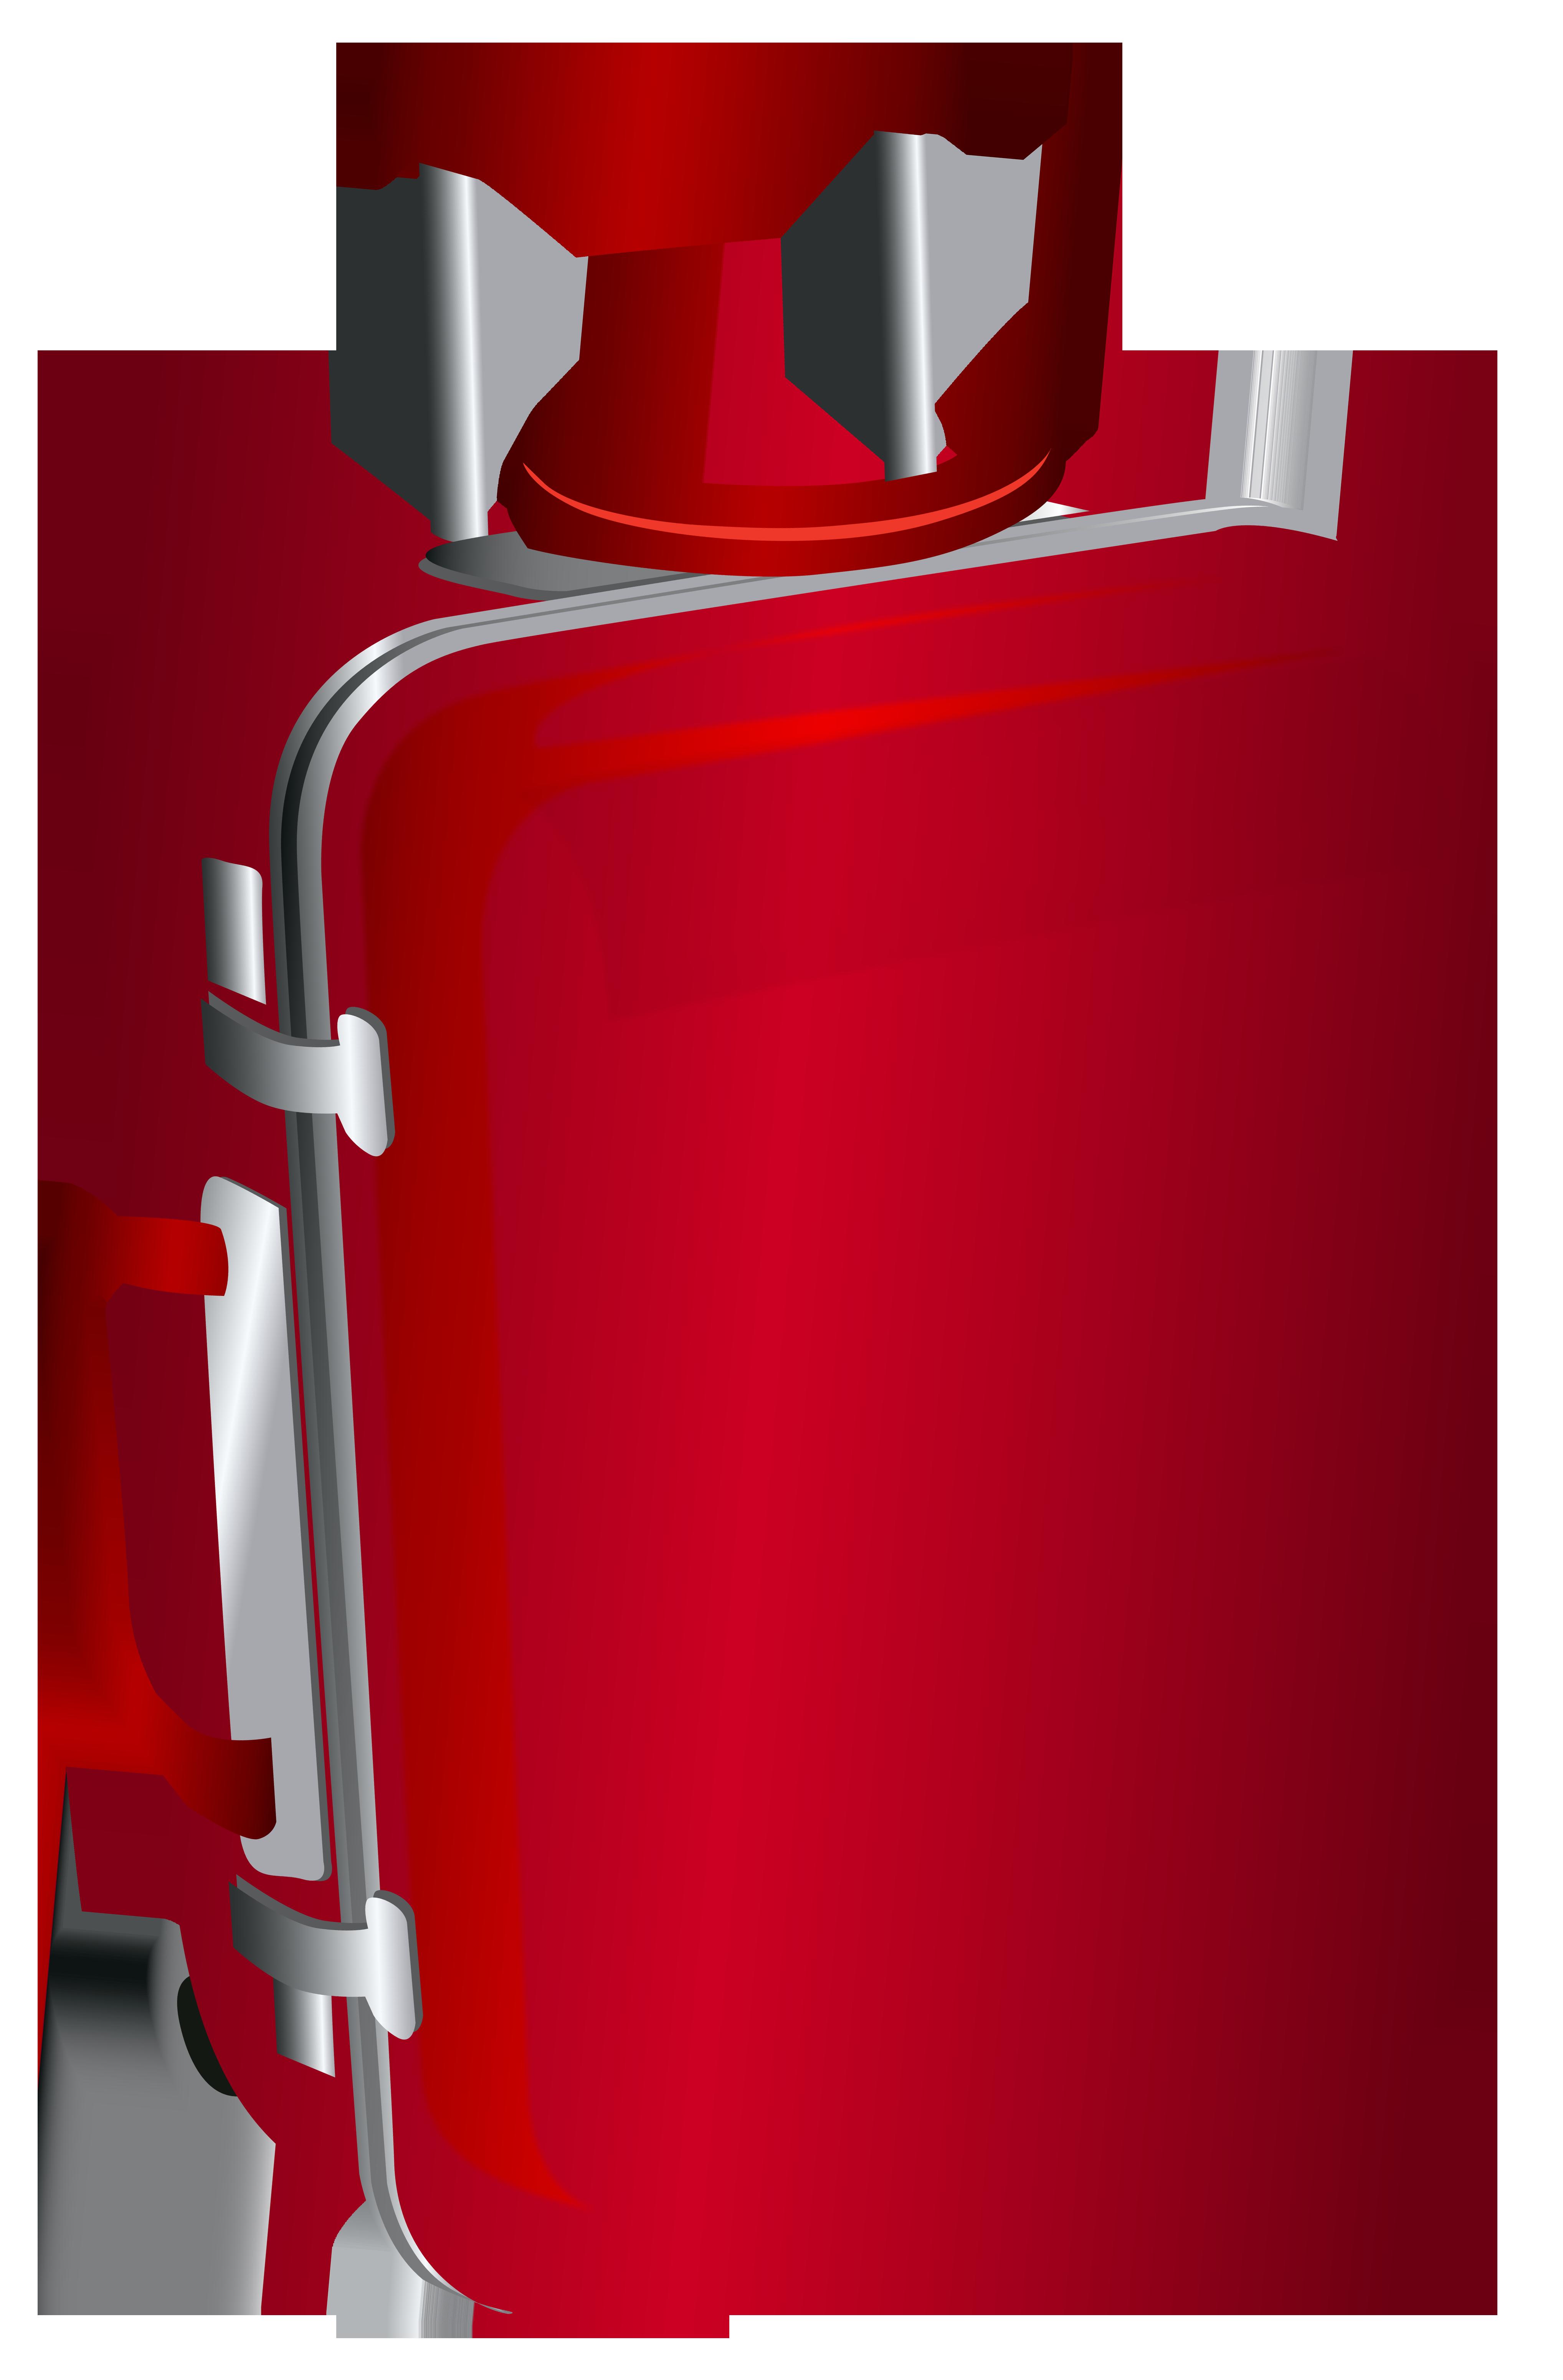 Luggage clipart animated, Luggage animated Transparent FREE.